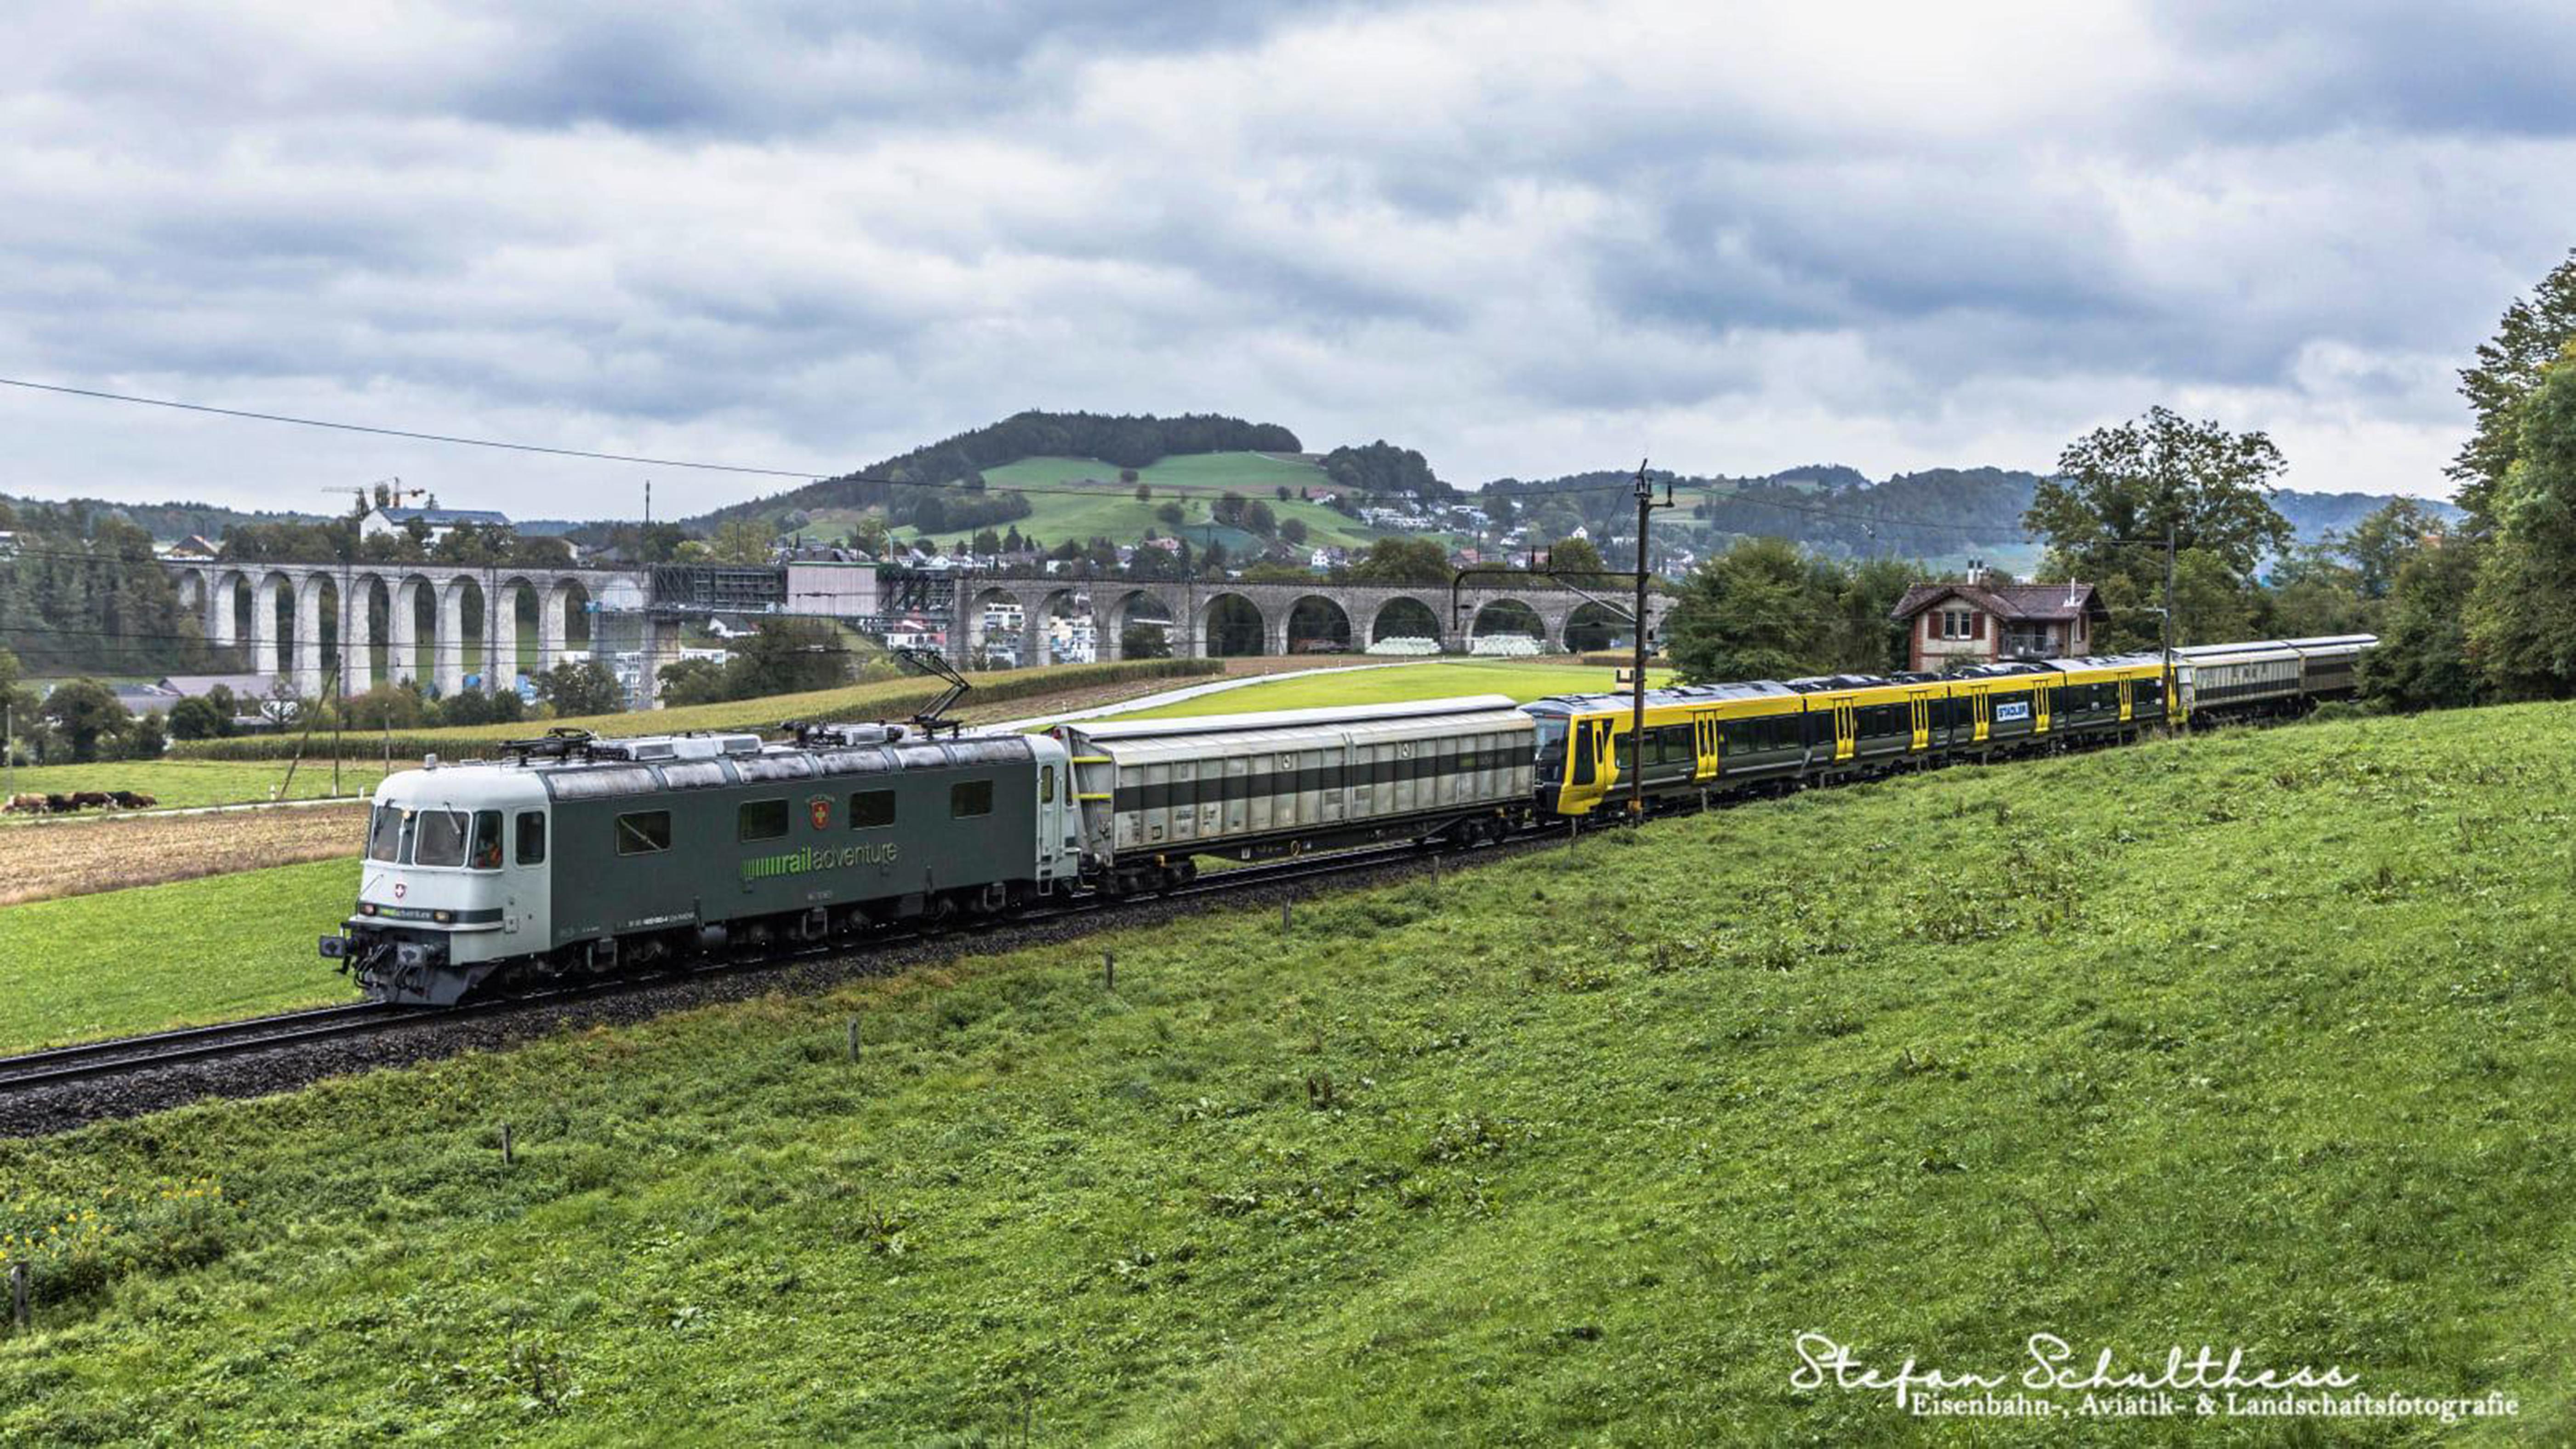 New Stadler train for Merseyrail en route to test track